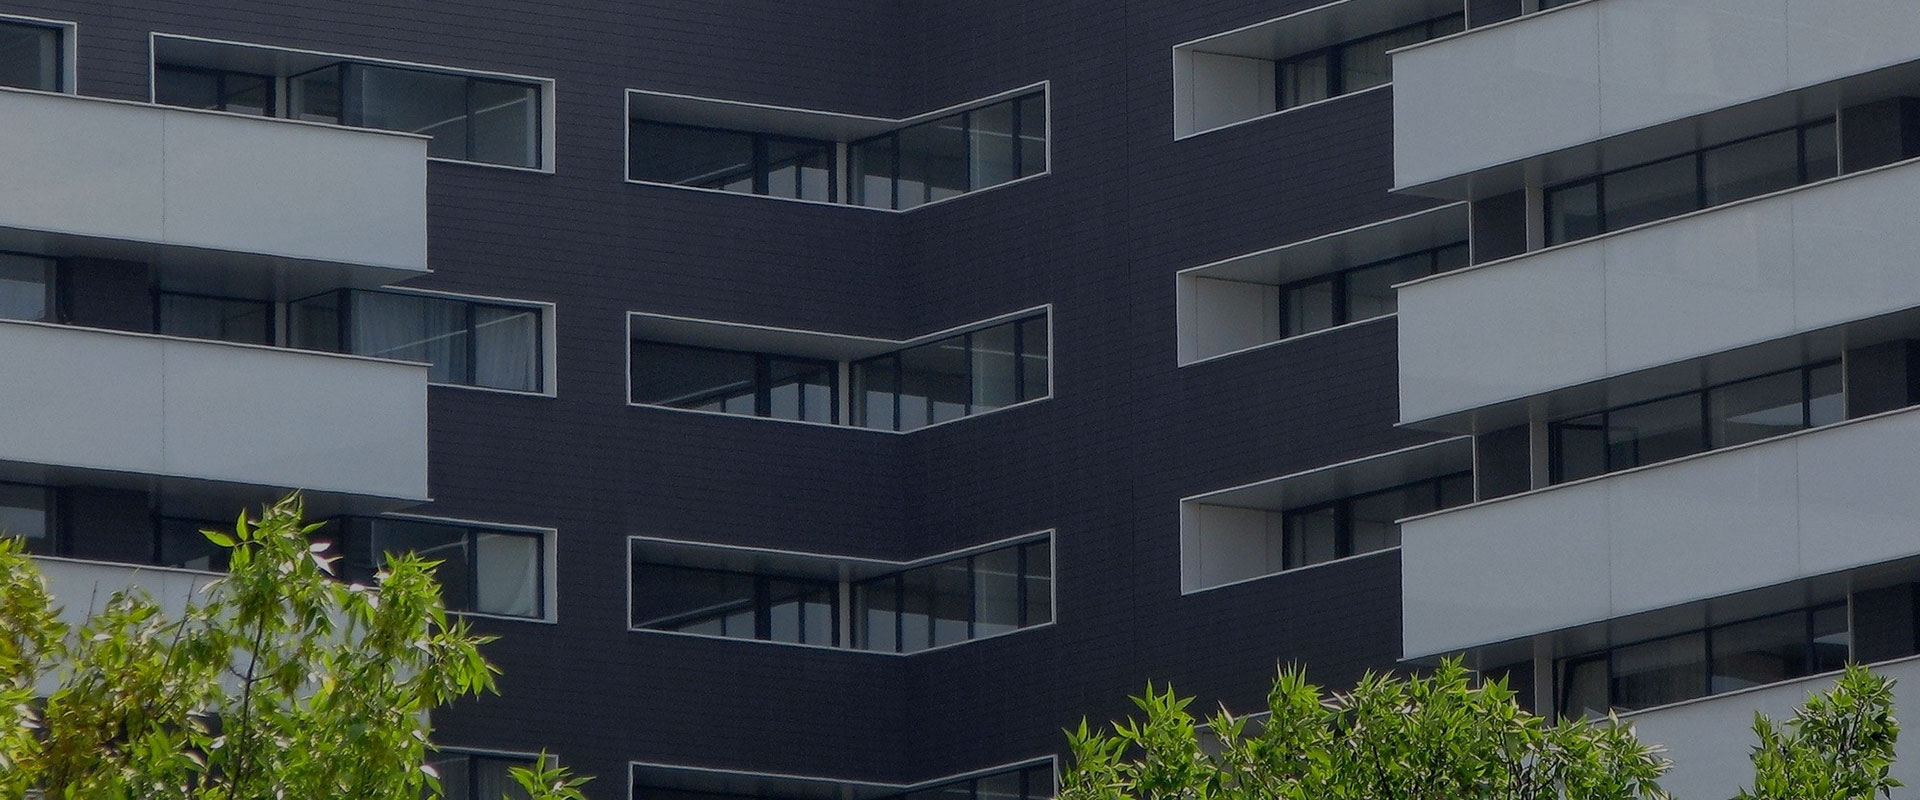 Immobilien in Stuttgart